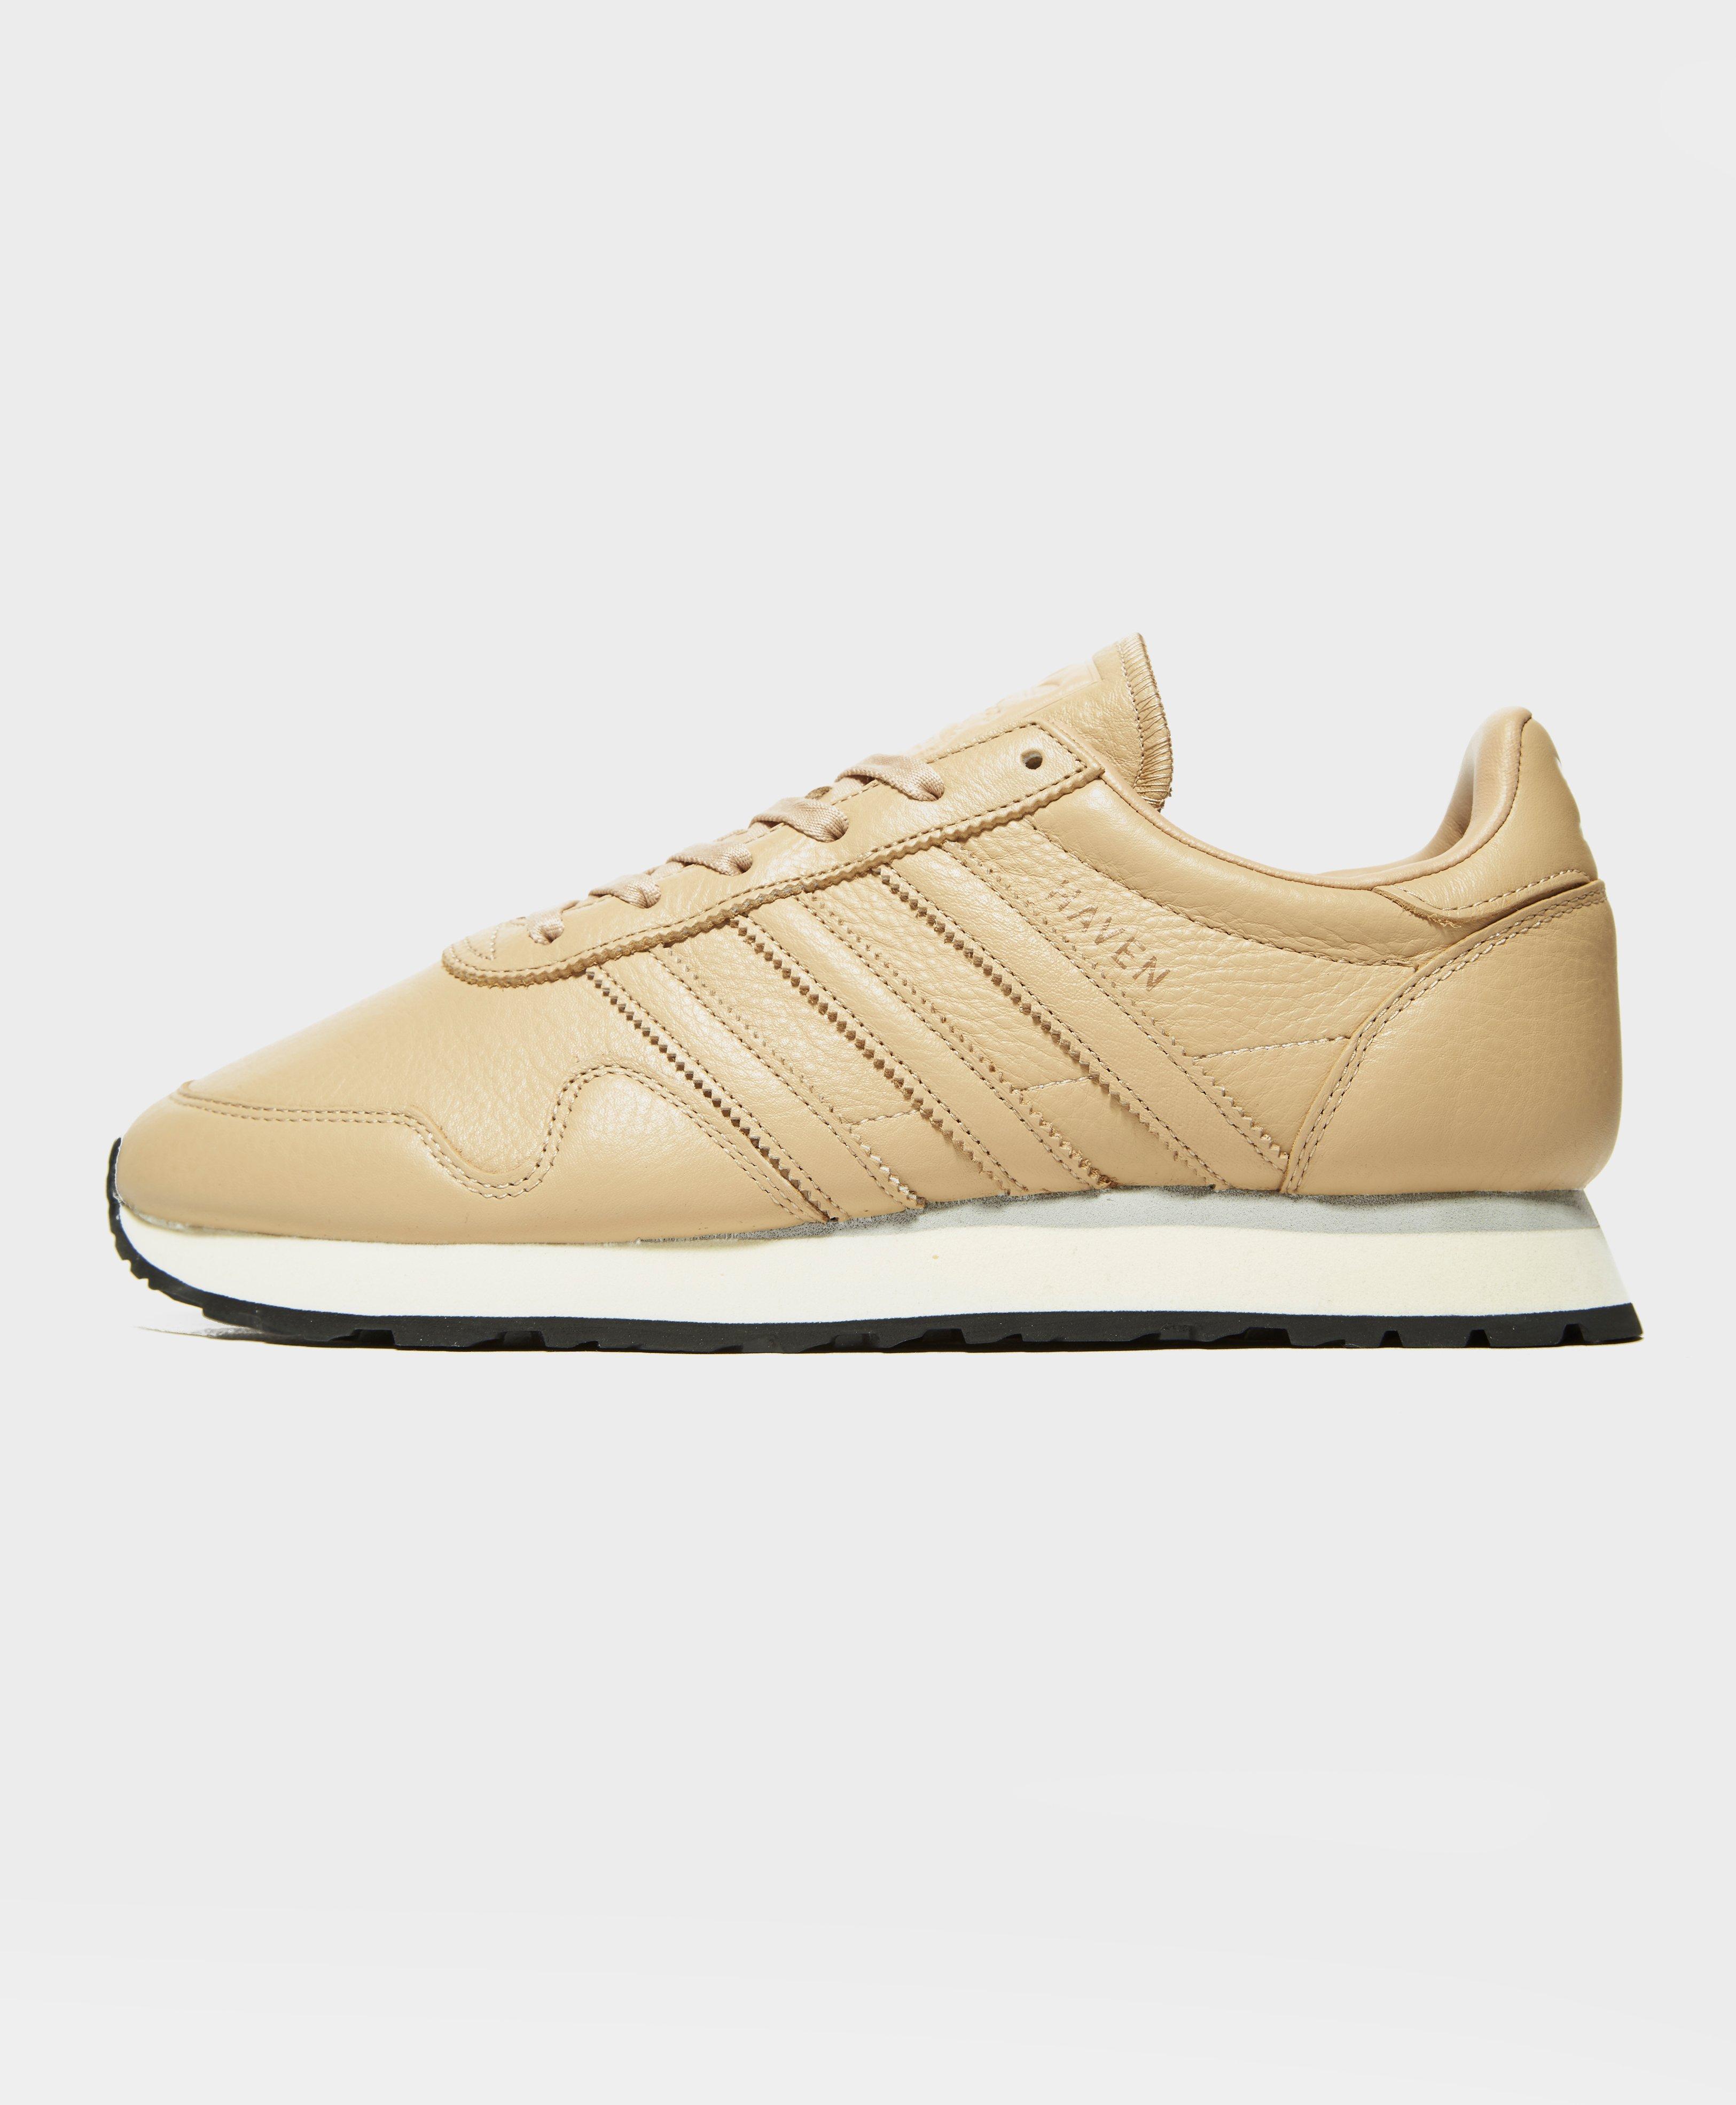 745e84c8704b51 Adidas Originals Haven Leather for Men - Lyst